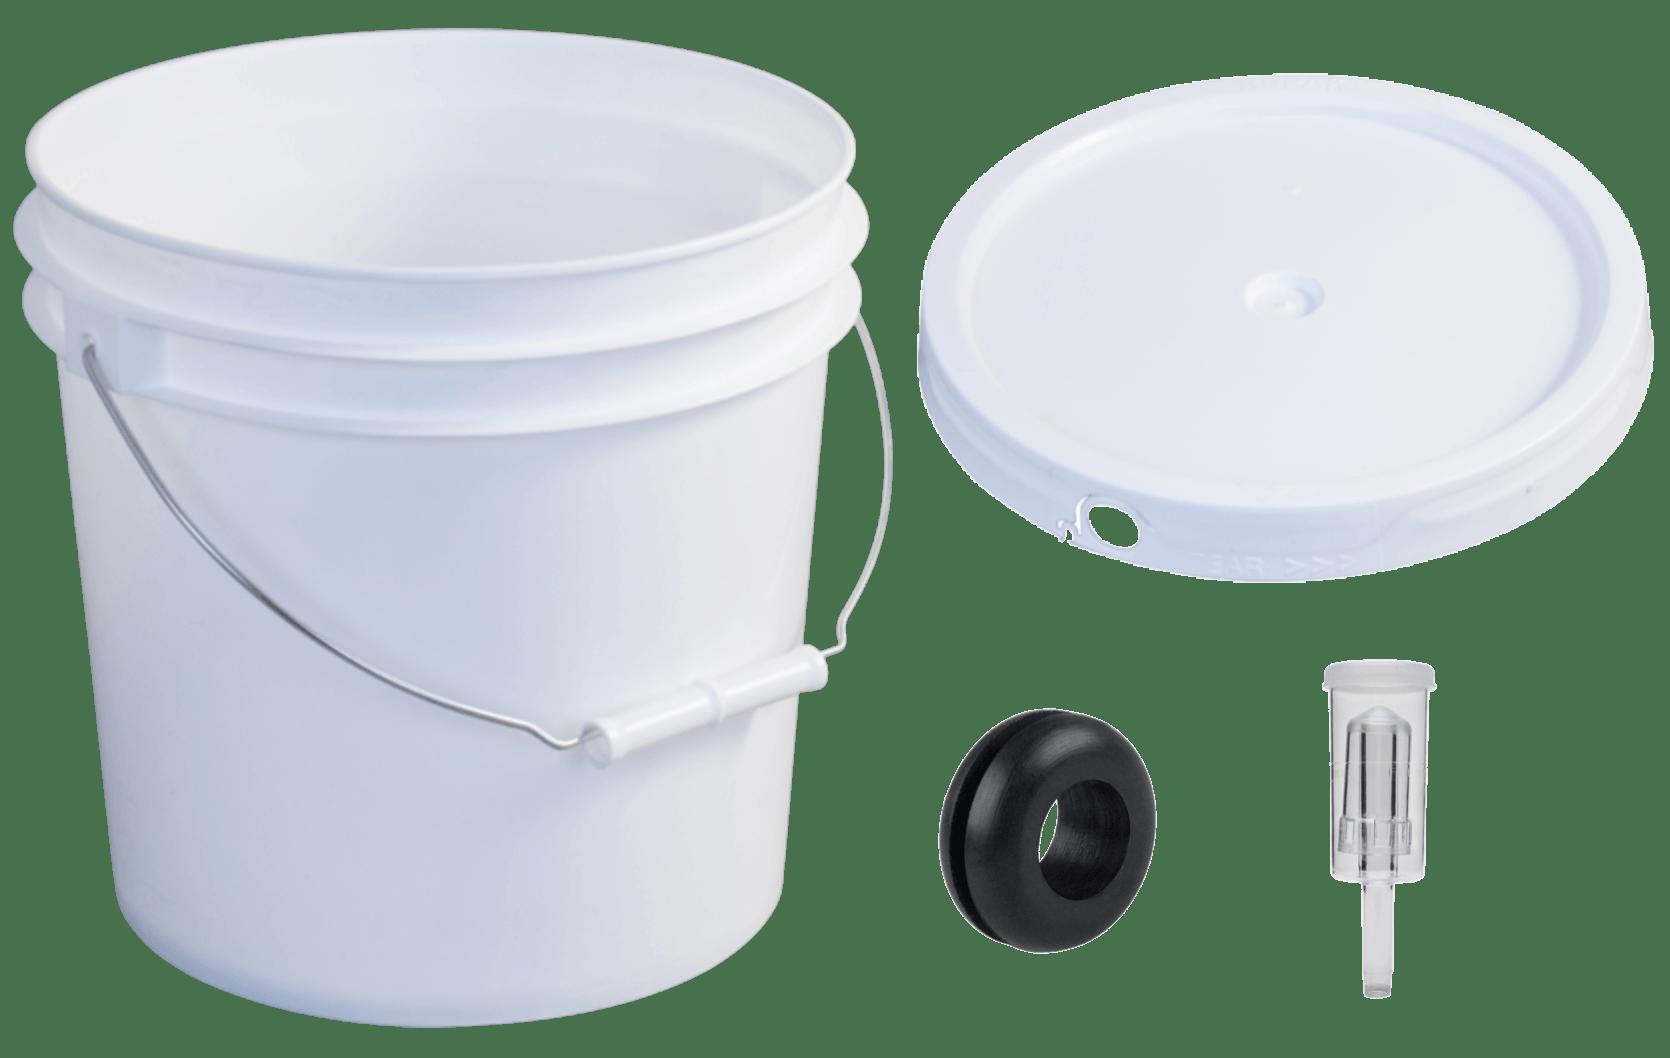 equipment needed for plastic bottling bucket and airlock